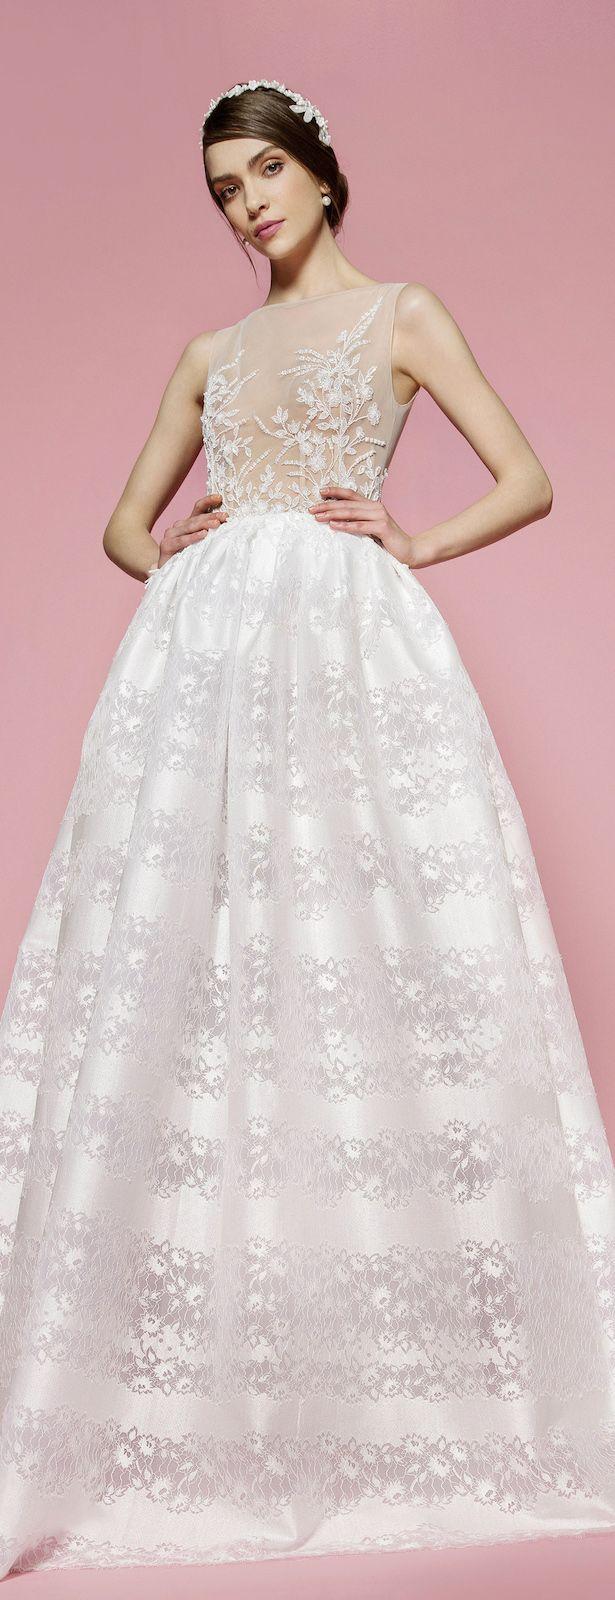 Georges hobeika bridal wedding dresses wedding dress wedding